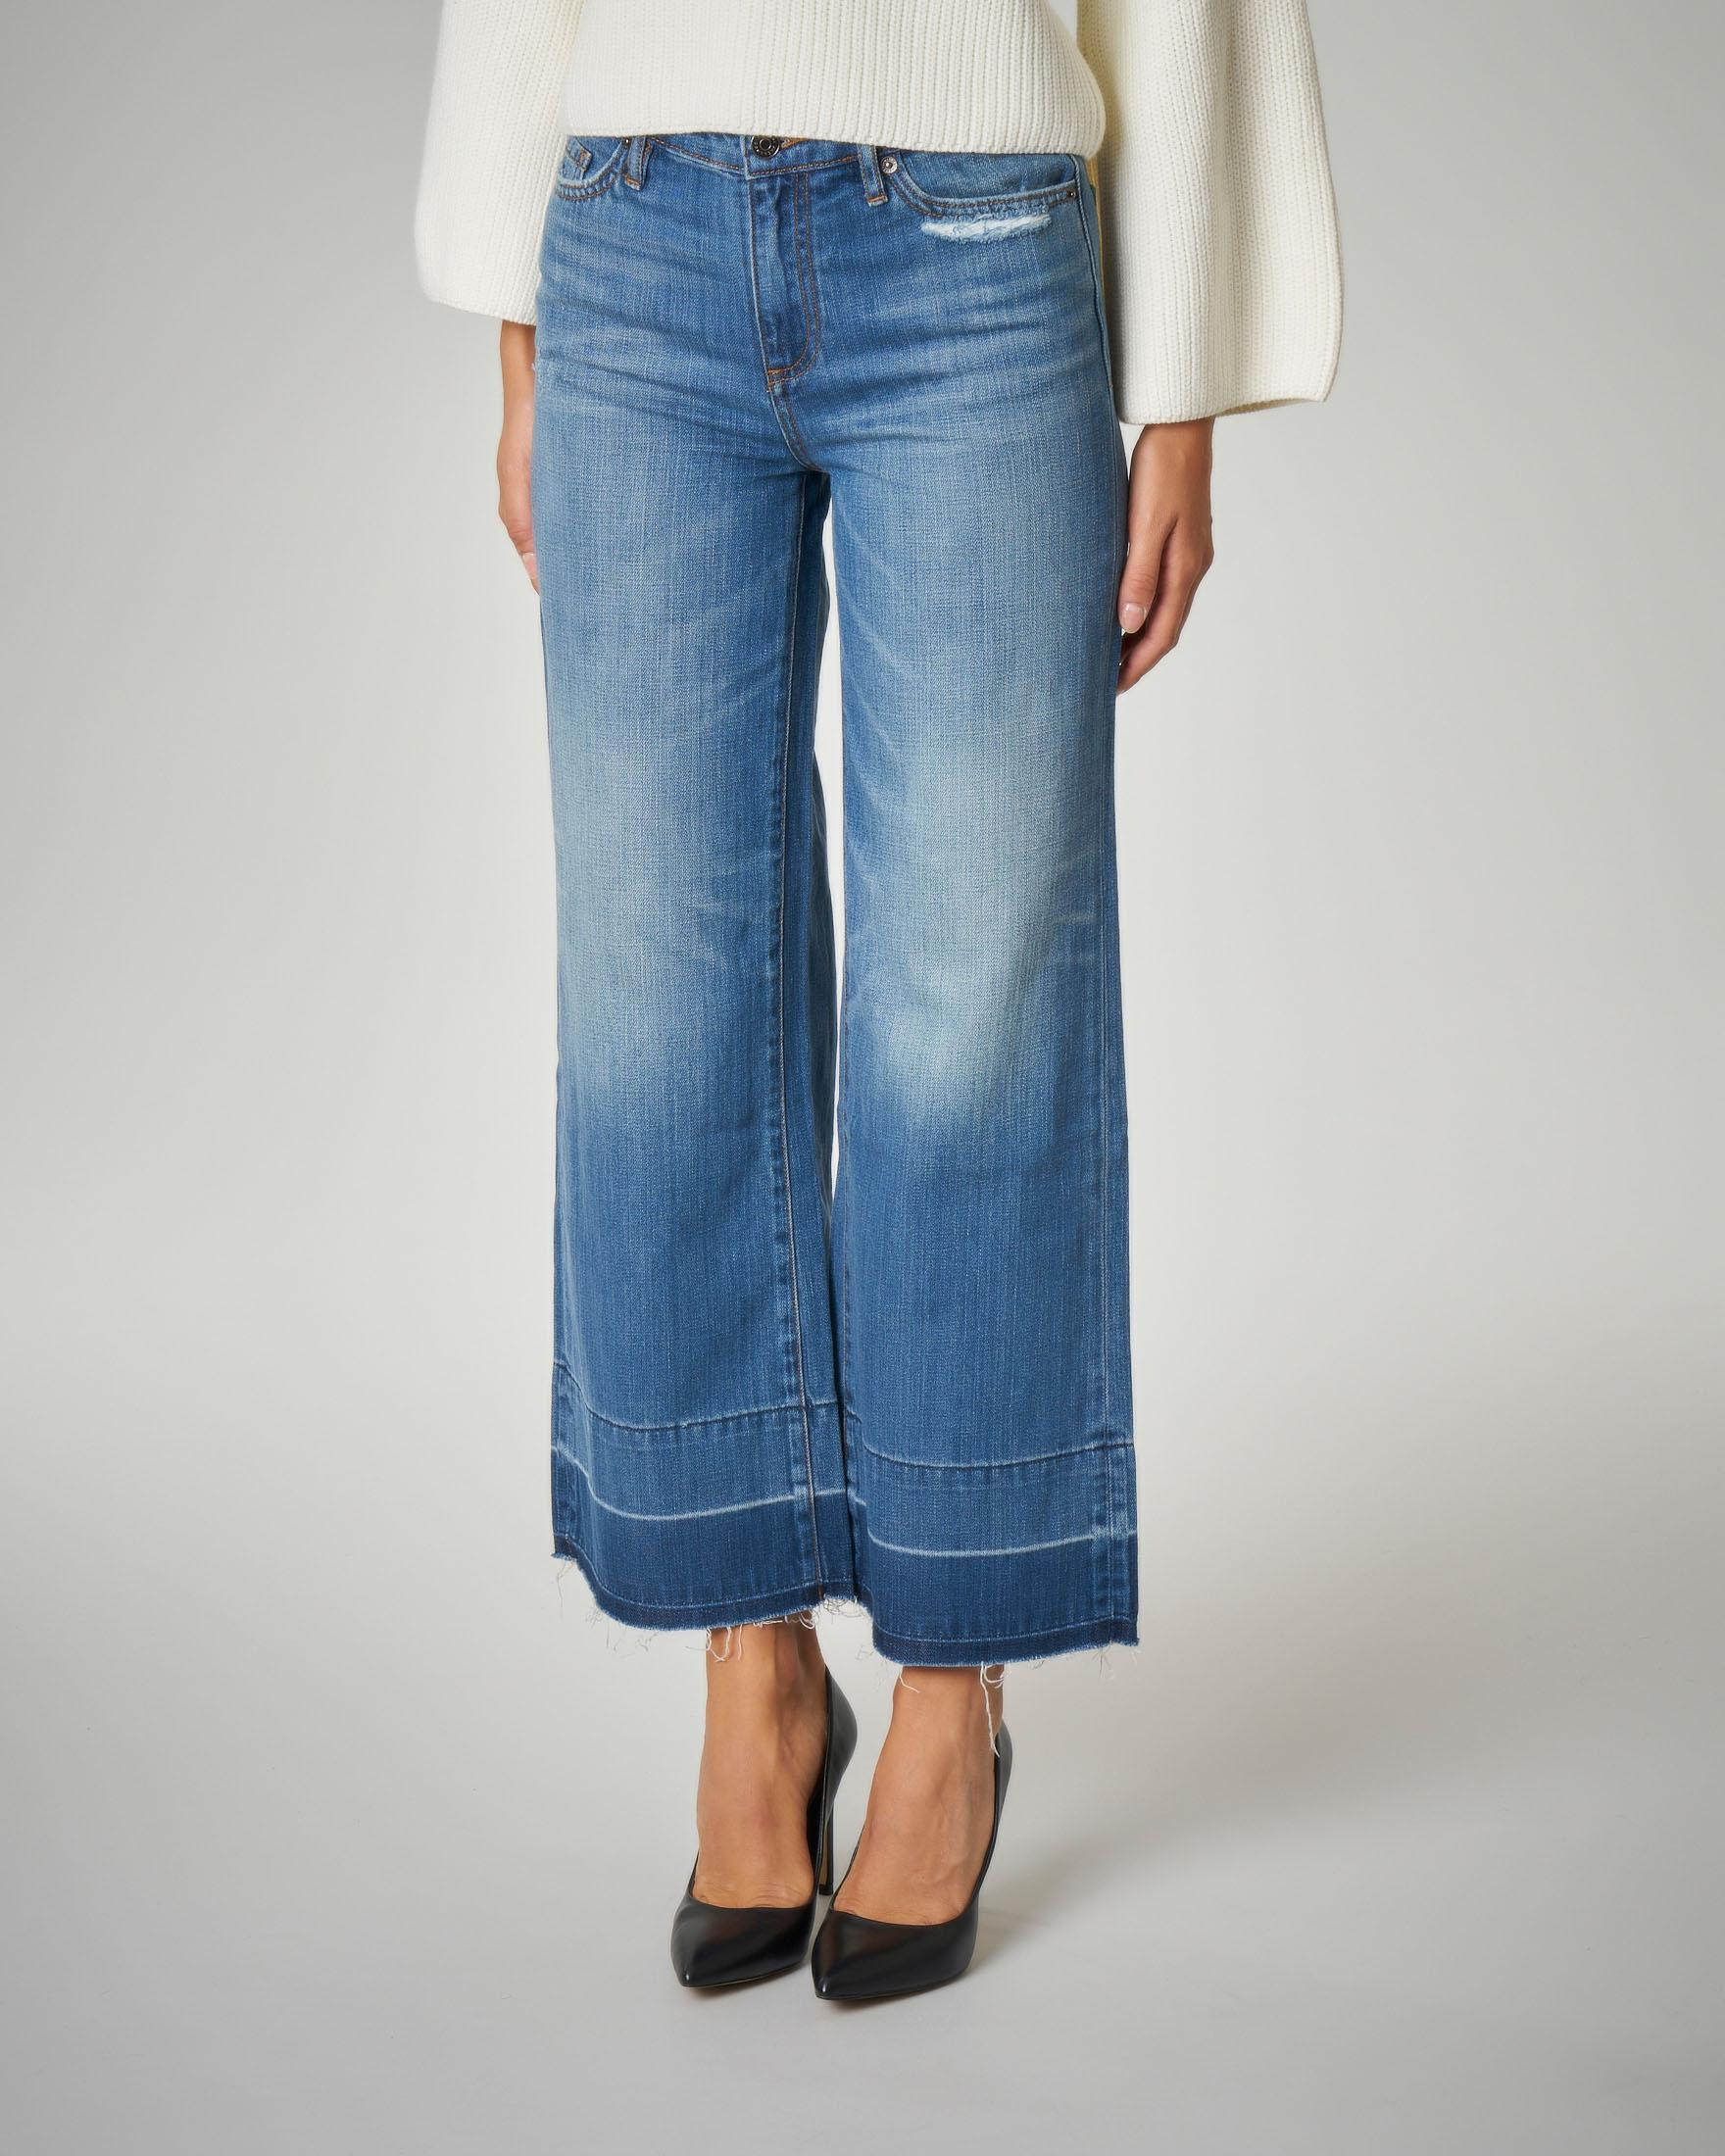 Flare jeans blu chiaro sfrangiati